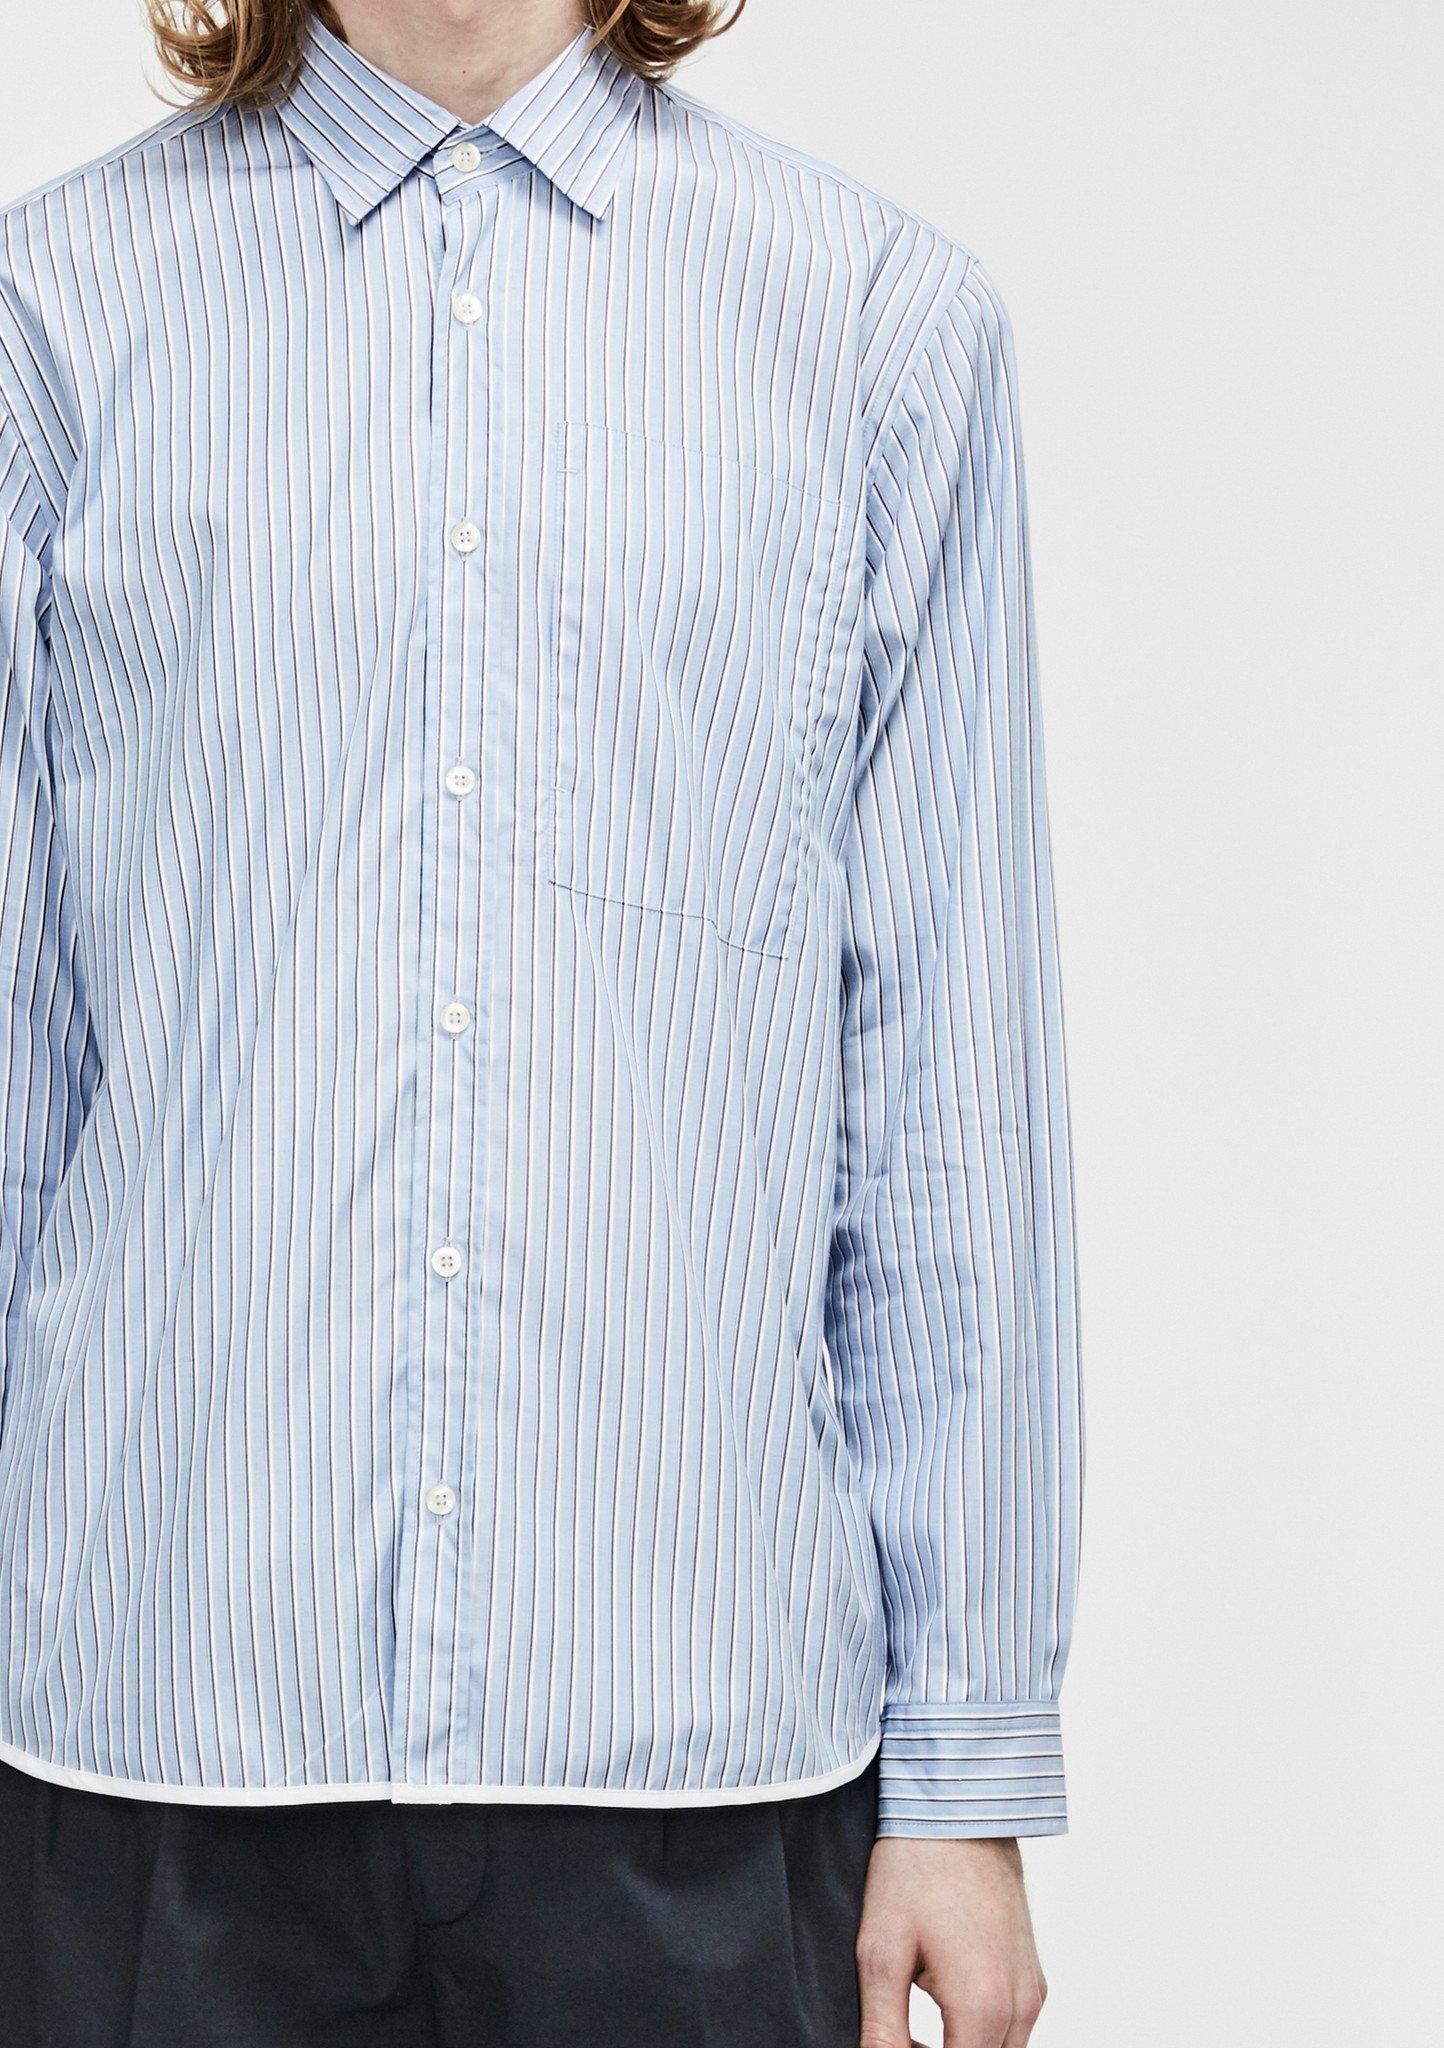 ls_shirt2_2048x2048